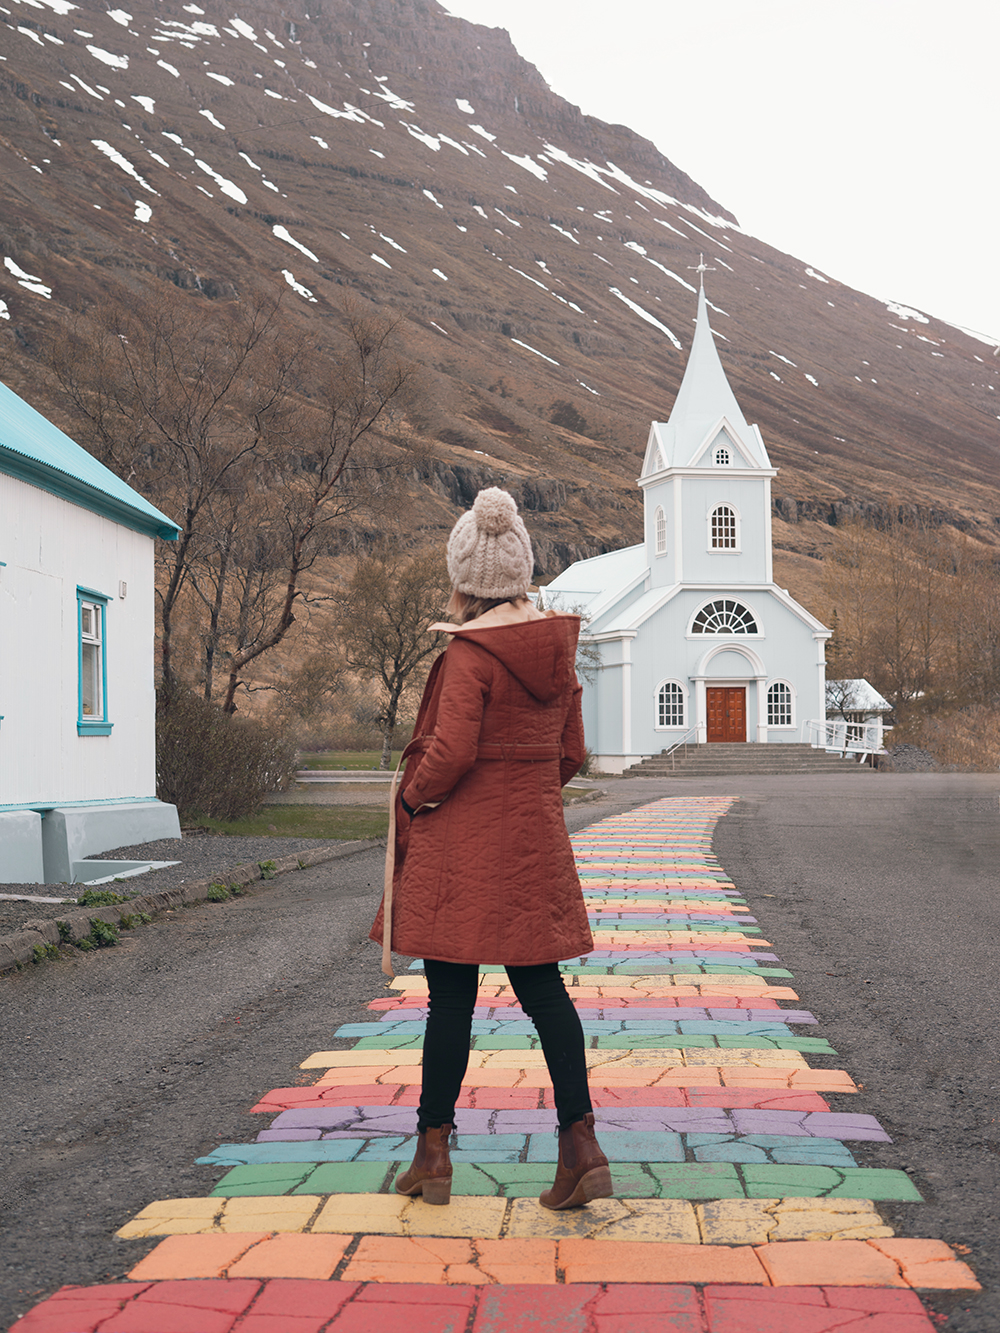 21iceland-seydisfjordur-bluechurch-rainbowroad-travel